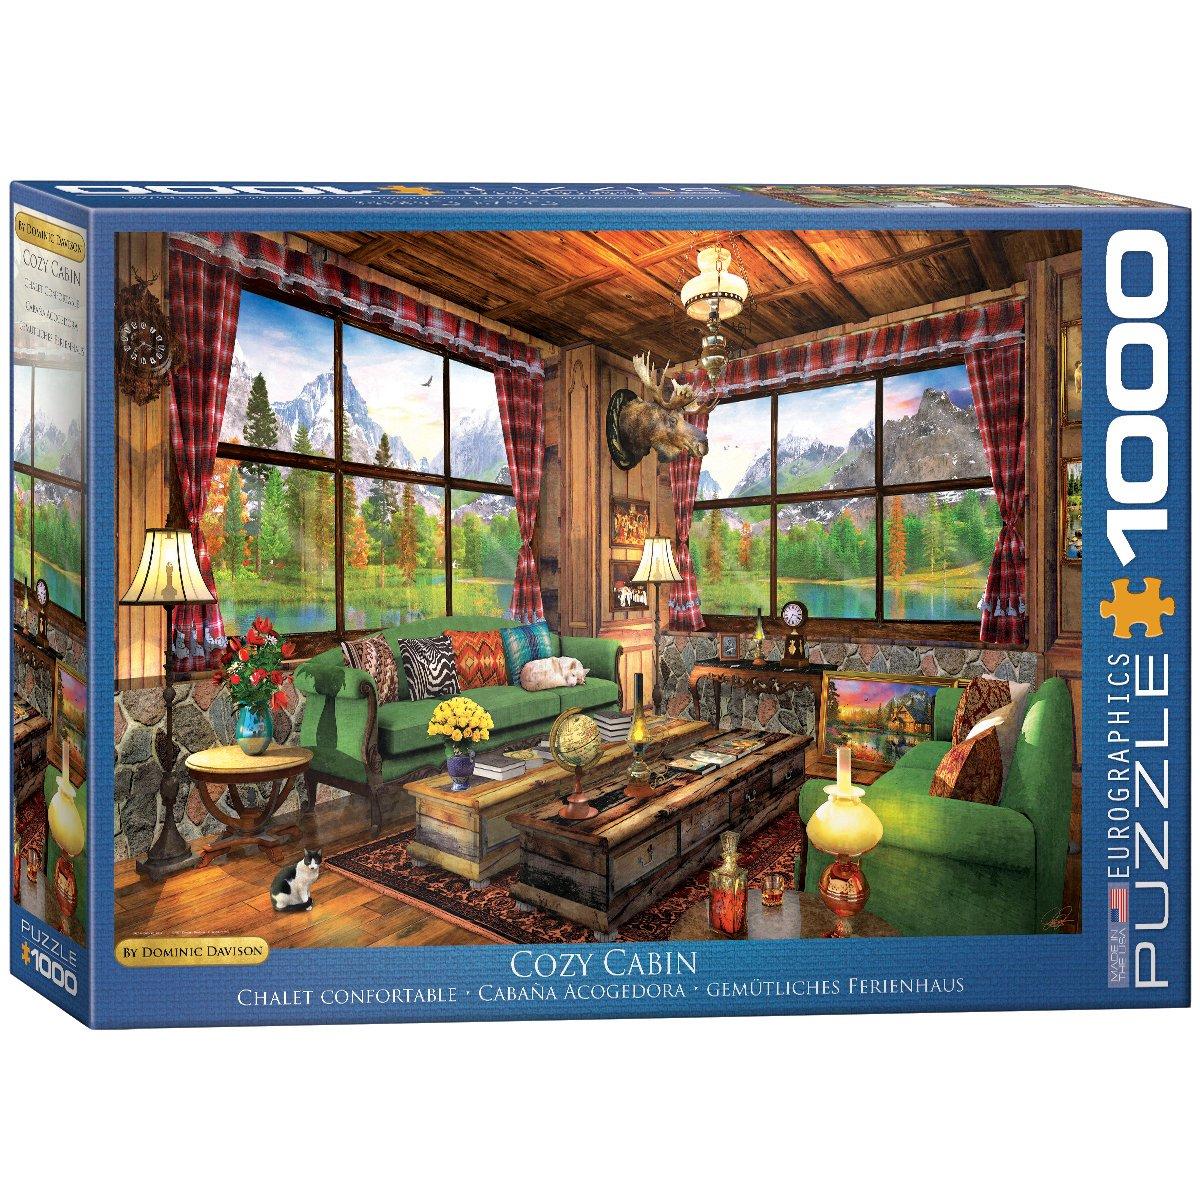 dominic-davison-cozy-cabin